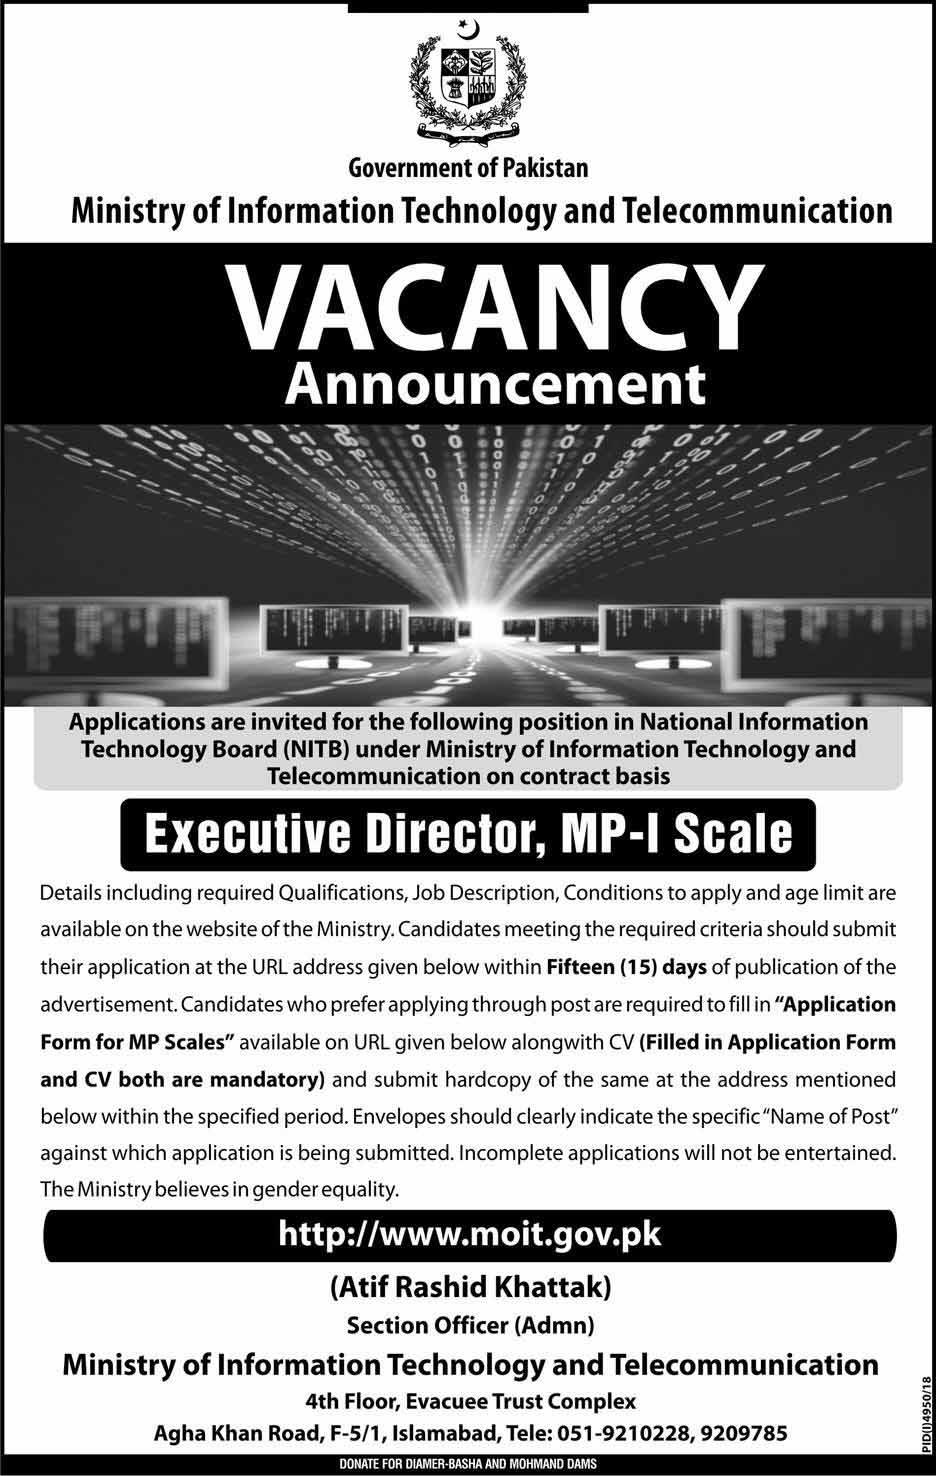 Ministry Of Information Technology And Telecommunication Latest Jobs | moit.gov.pk